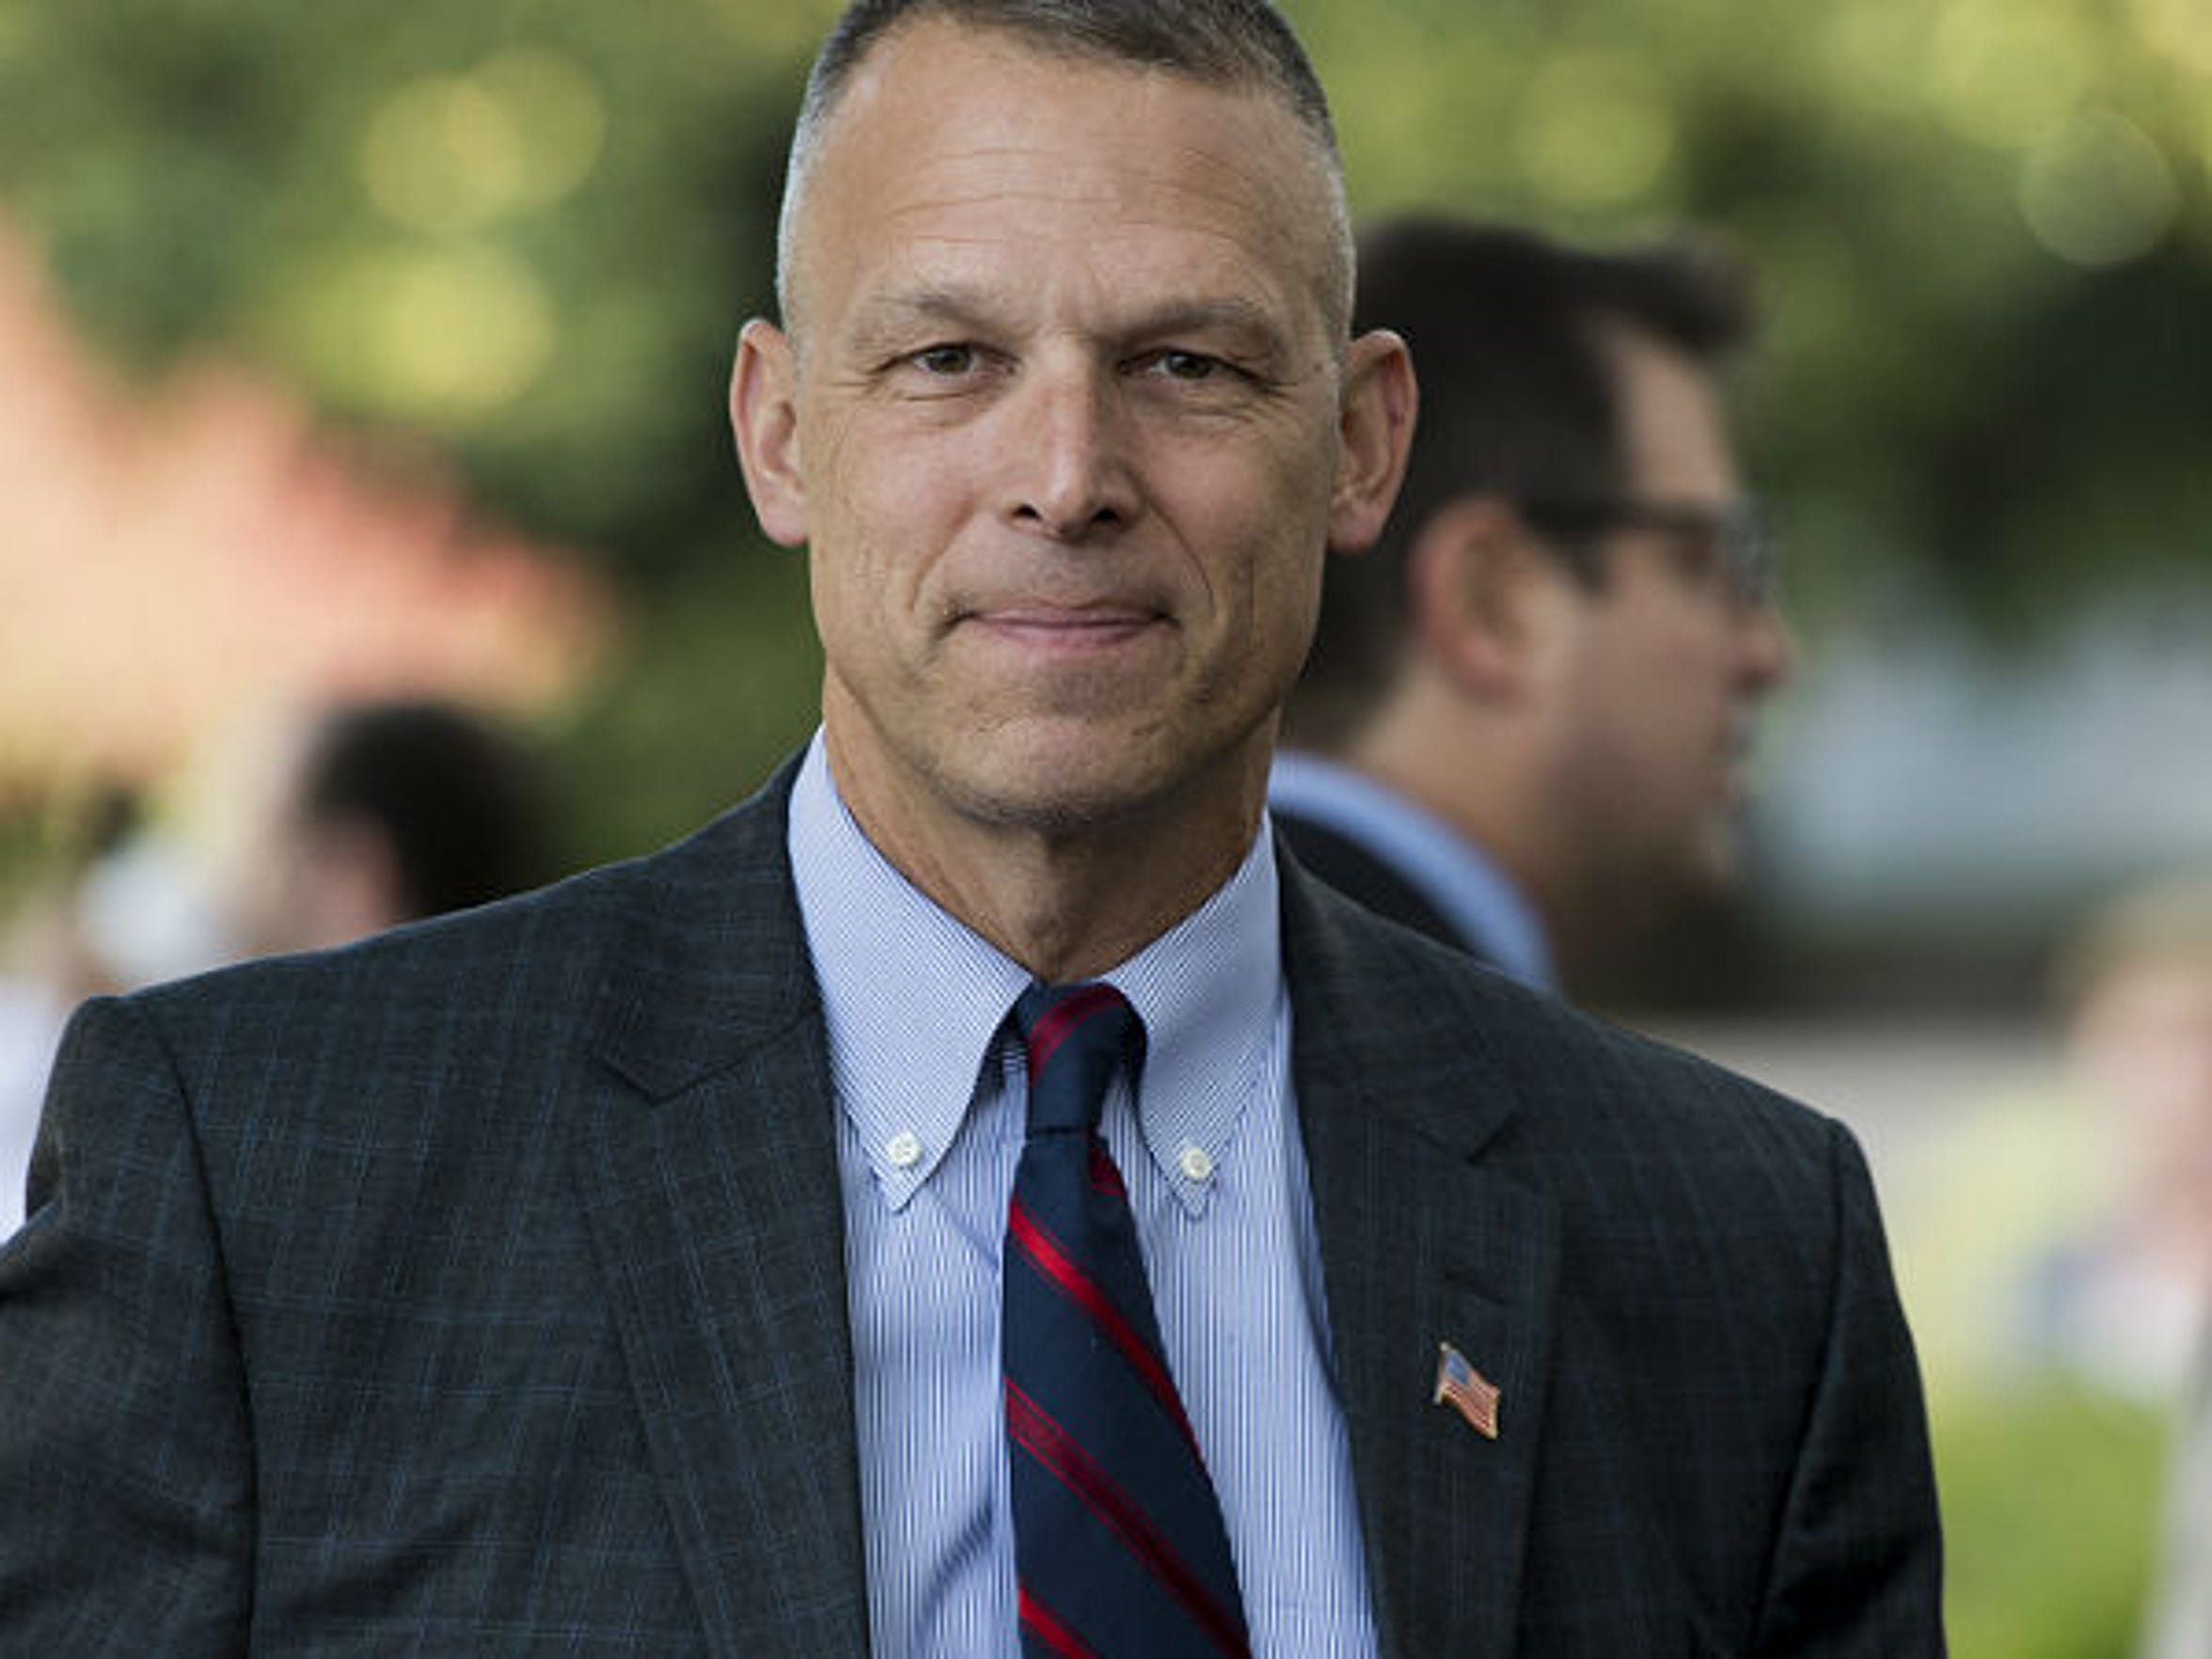 U.S. Congressman Scott Perry